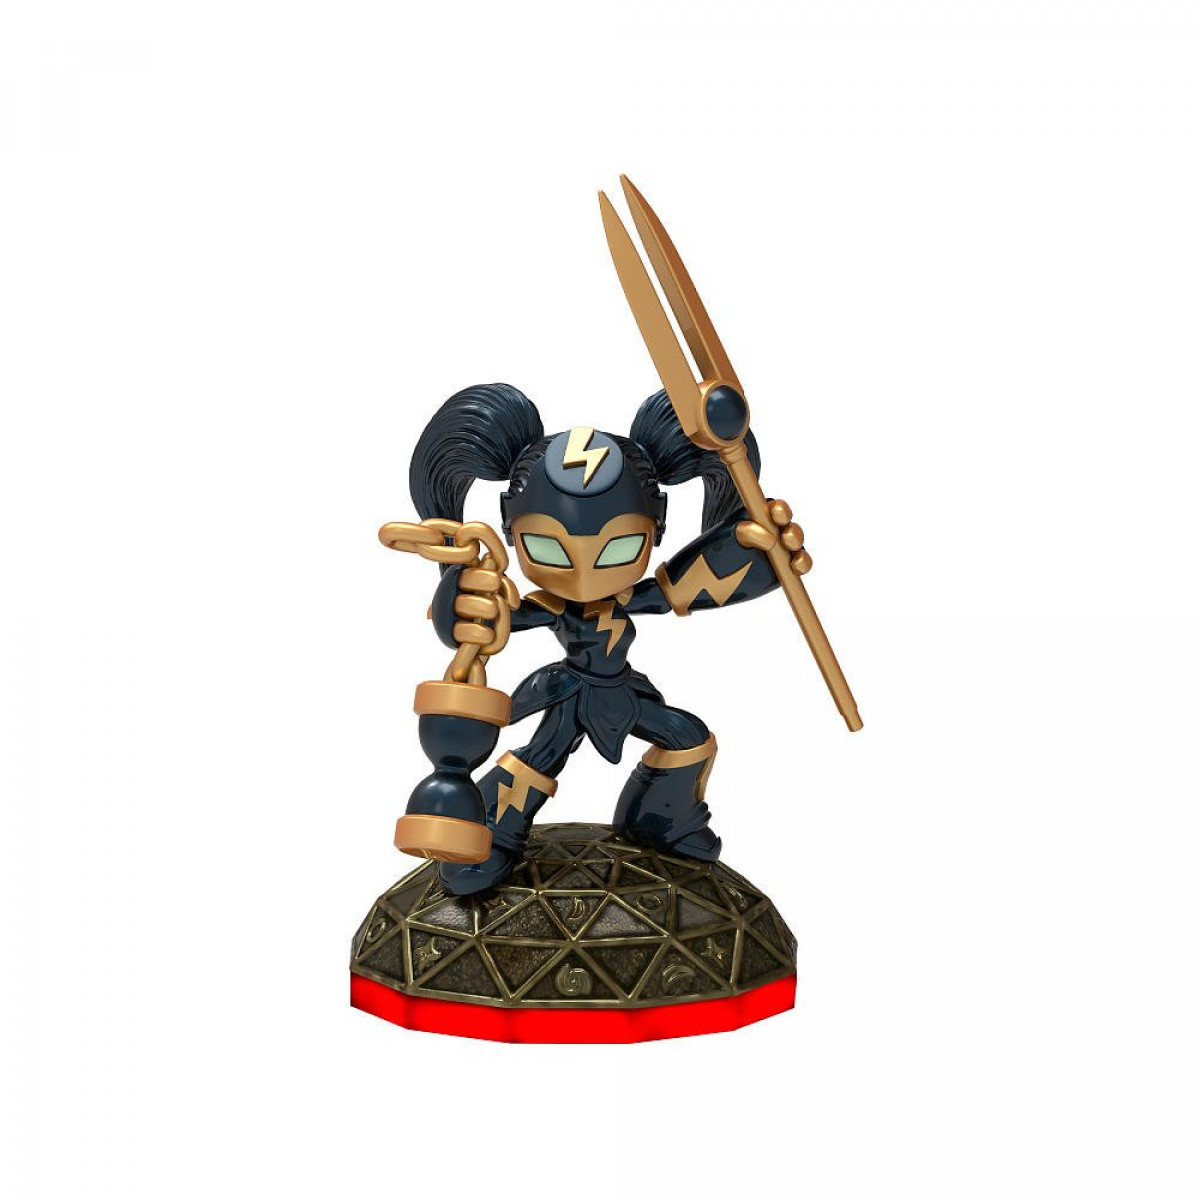 Skylanders Trap Team - Deja Vu játékfigura (legendary)